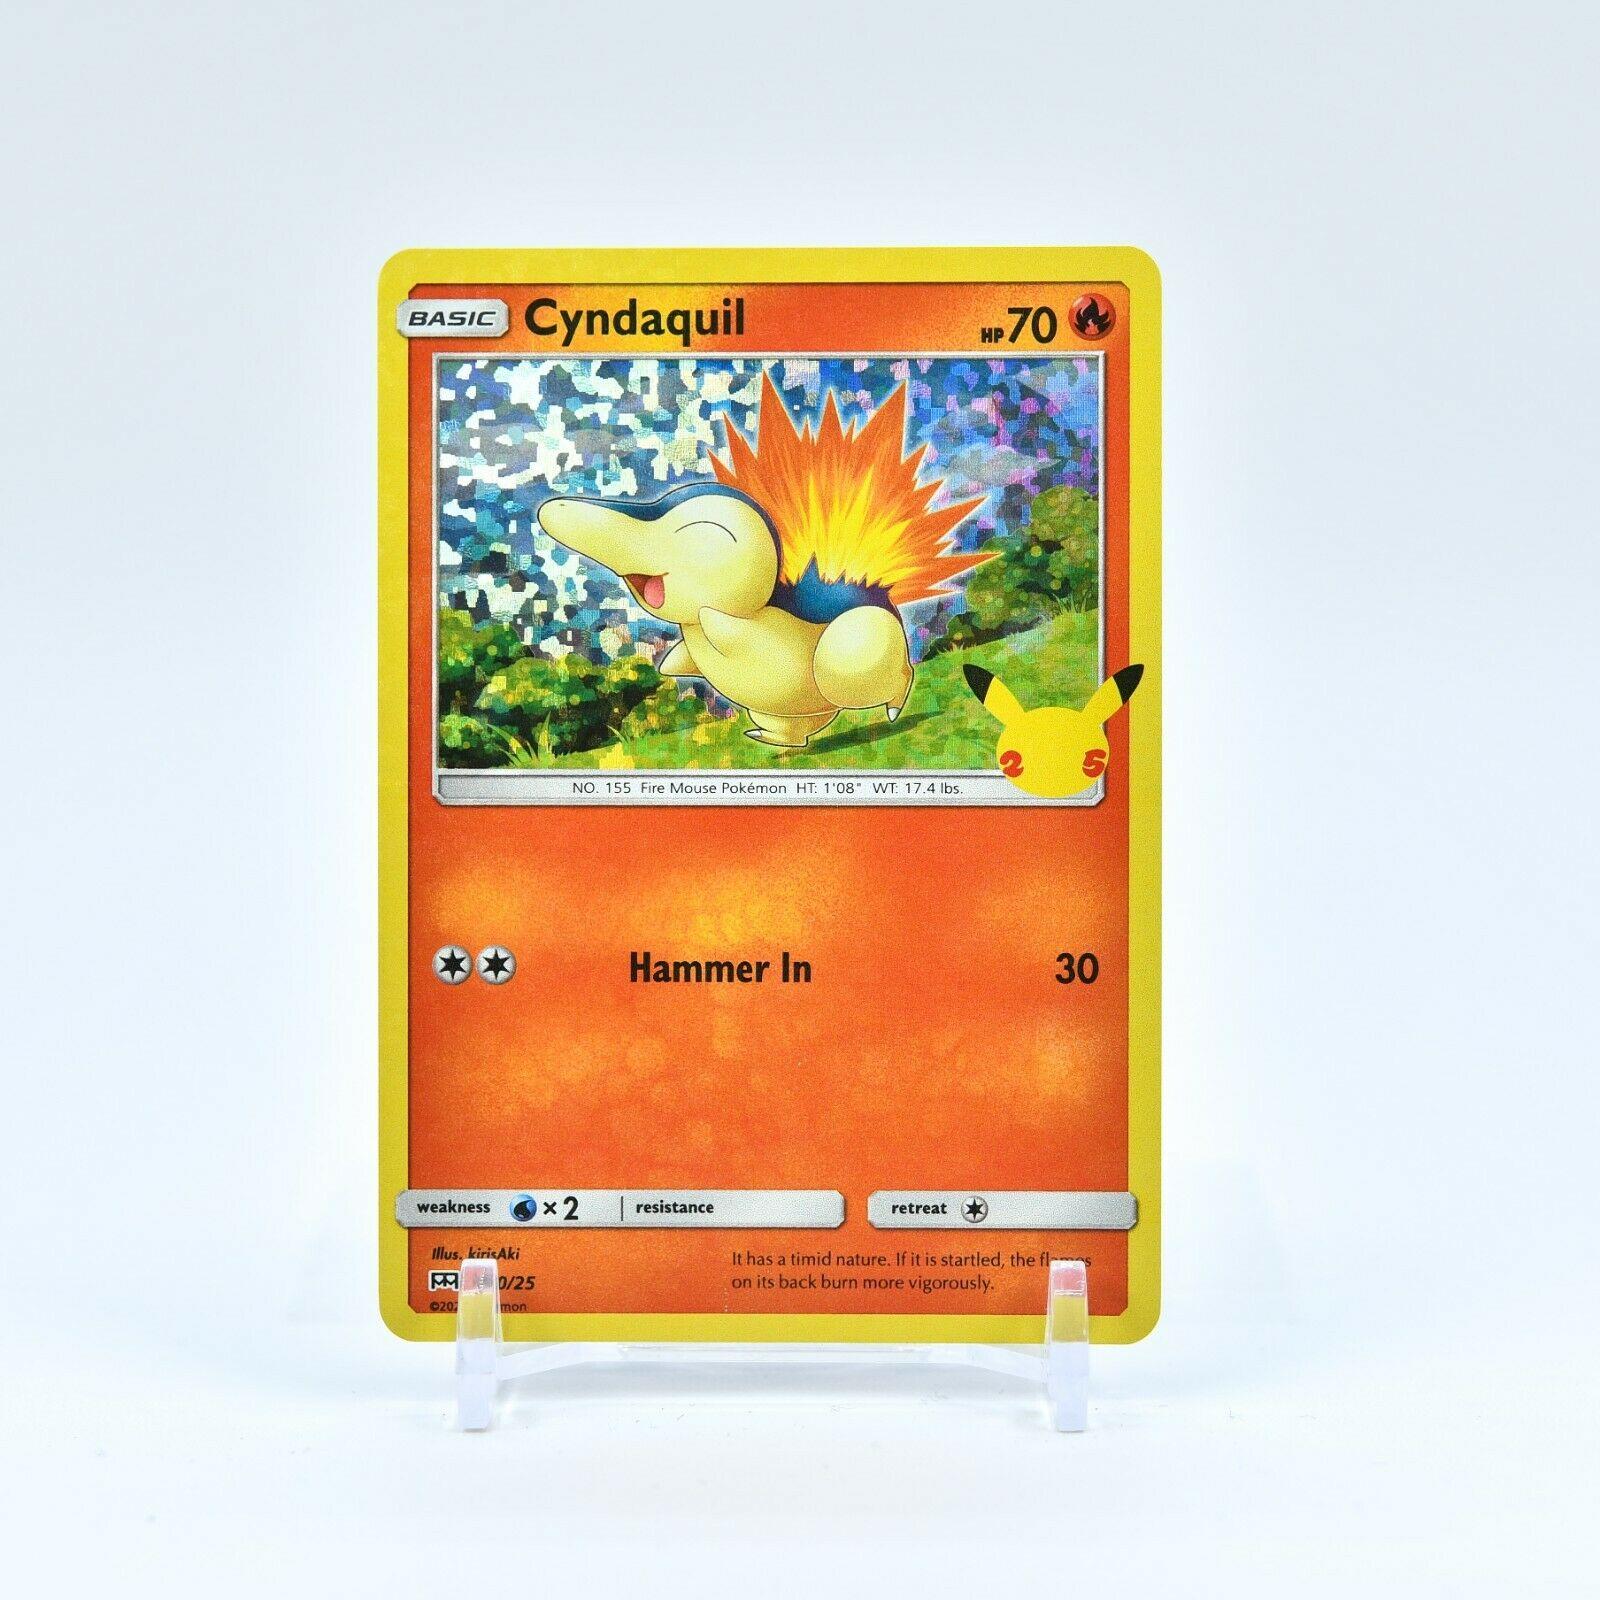 Cyndaquil - 10/25 Mcdonald's 25th Anniversary Holo Starter Pokemon - NM/MINT - Image 1